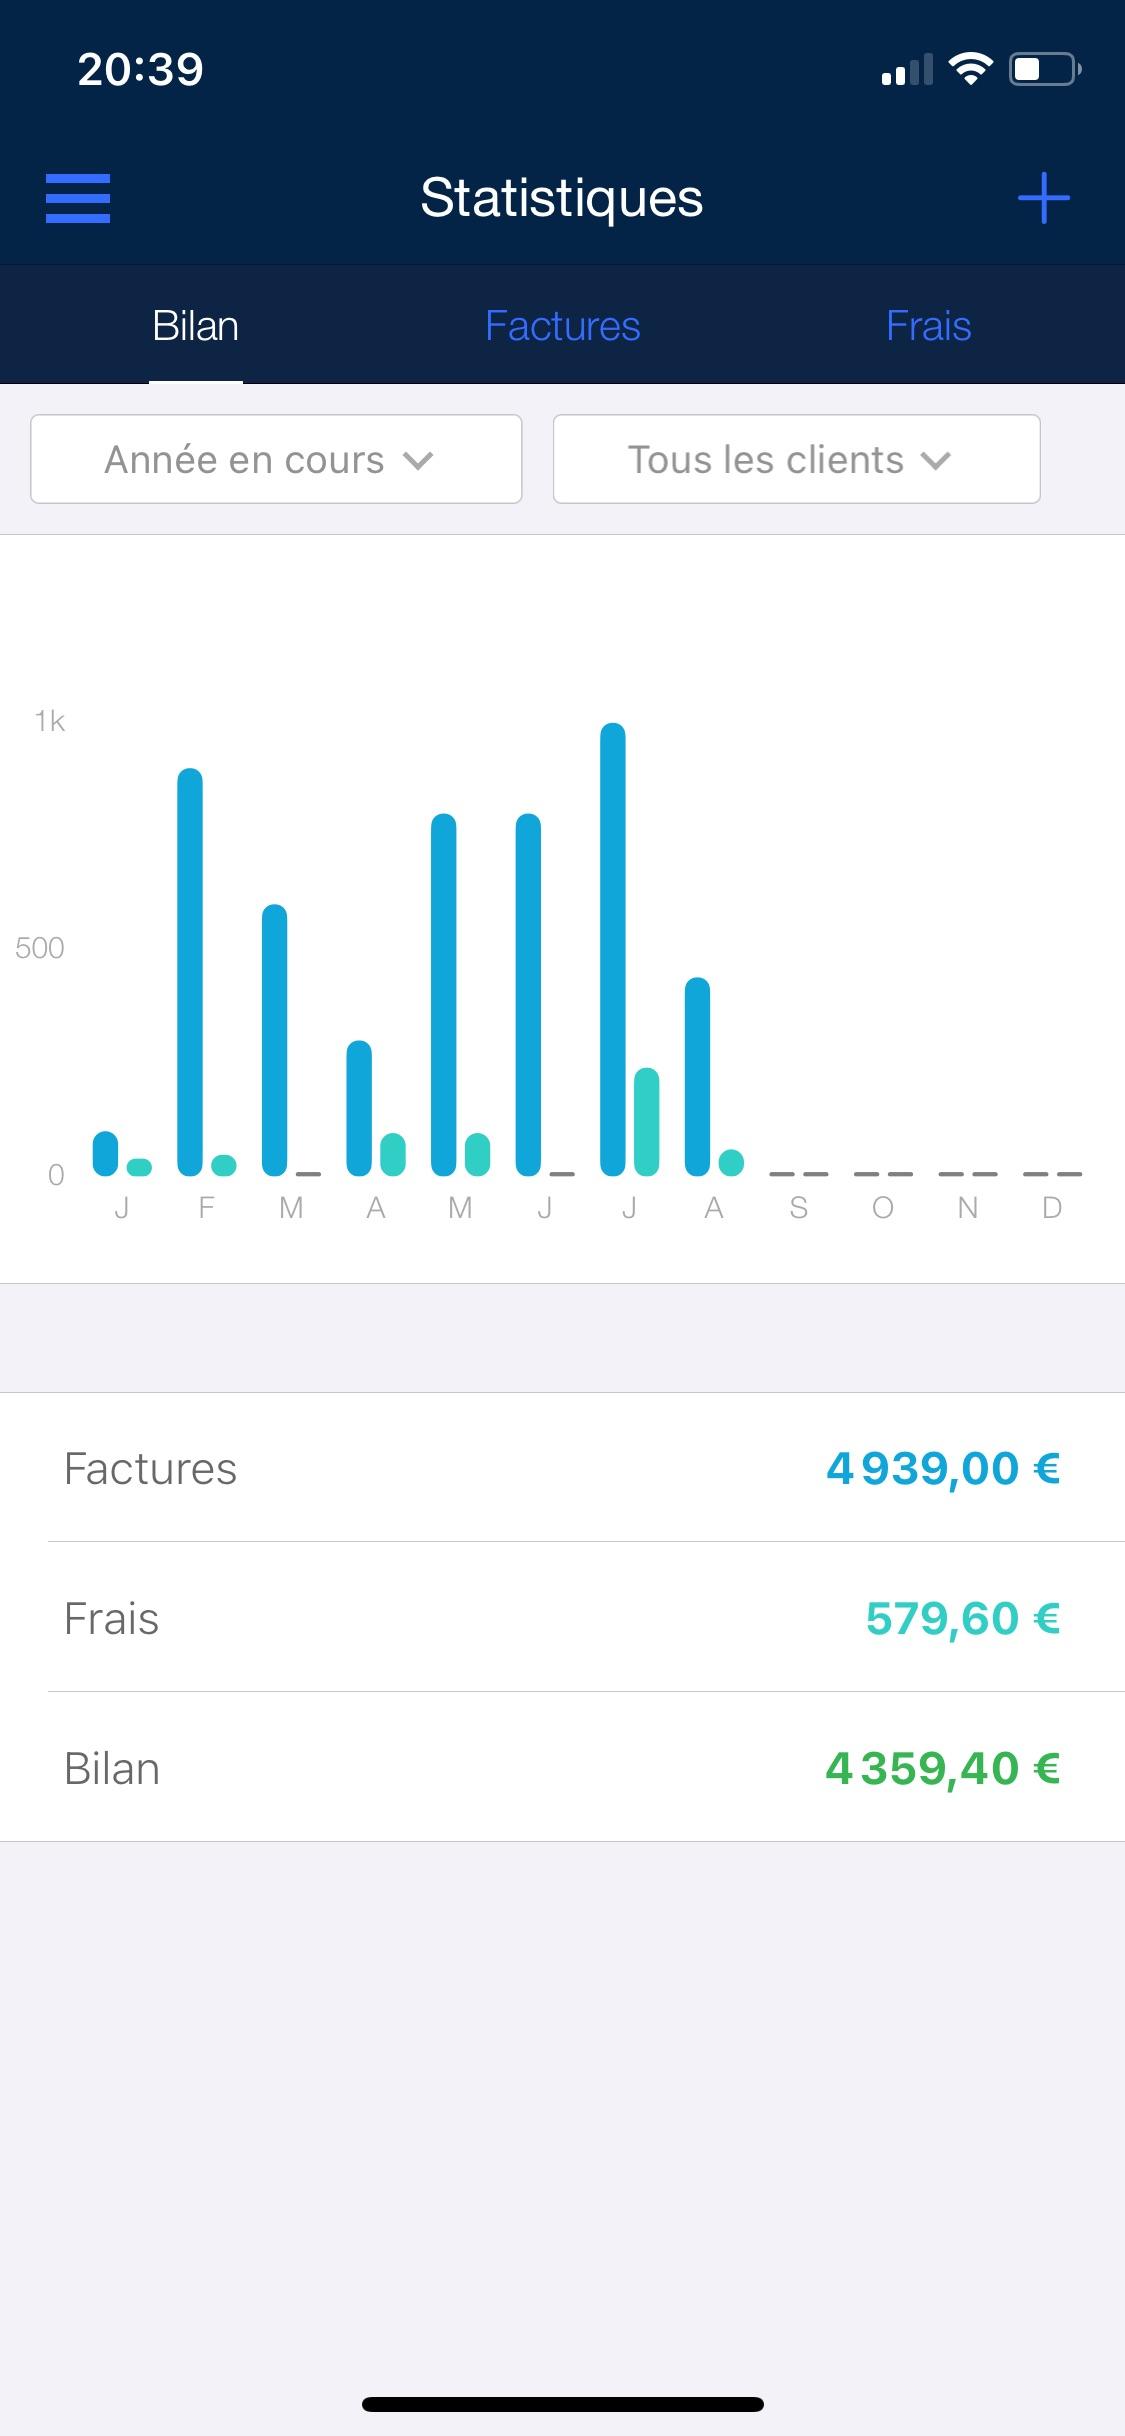 invoice app statistiques bilan